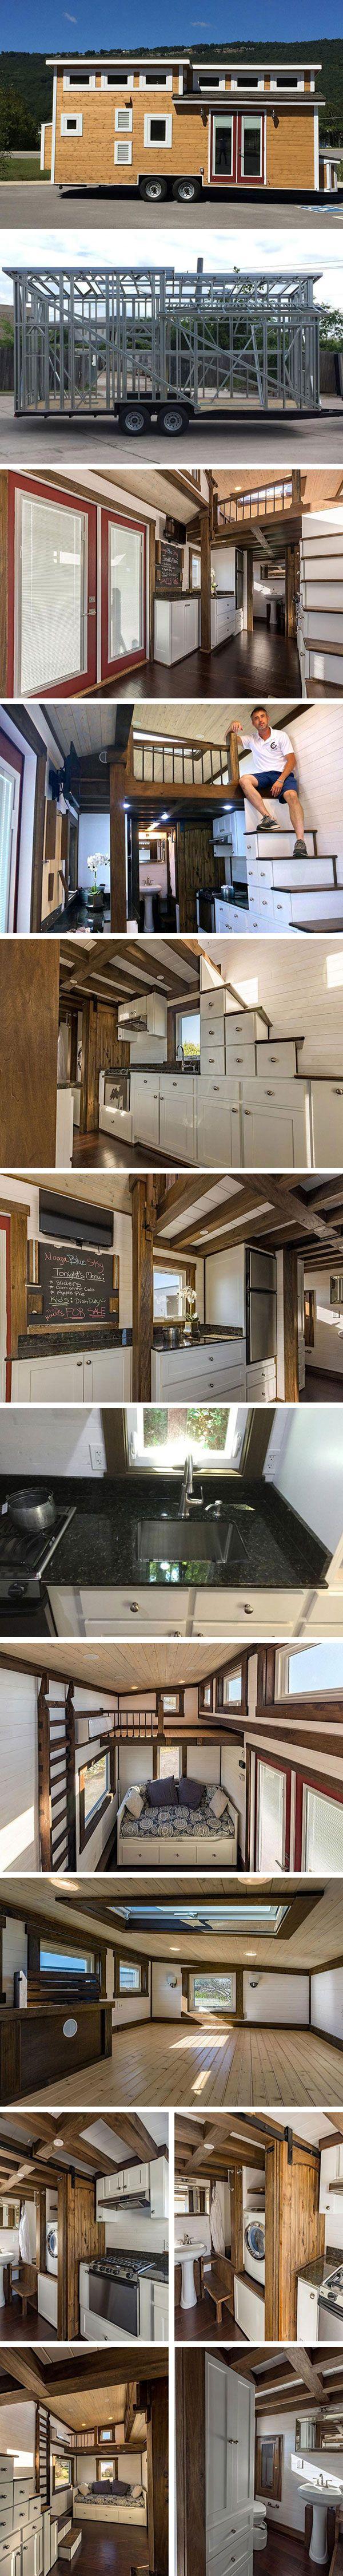 Дом на колесах Nooga Blue Sky от Tiny House Chattanooga #tinyhomesdigest #tinyhouse #houseonwheels #camper